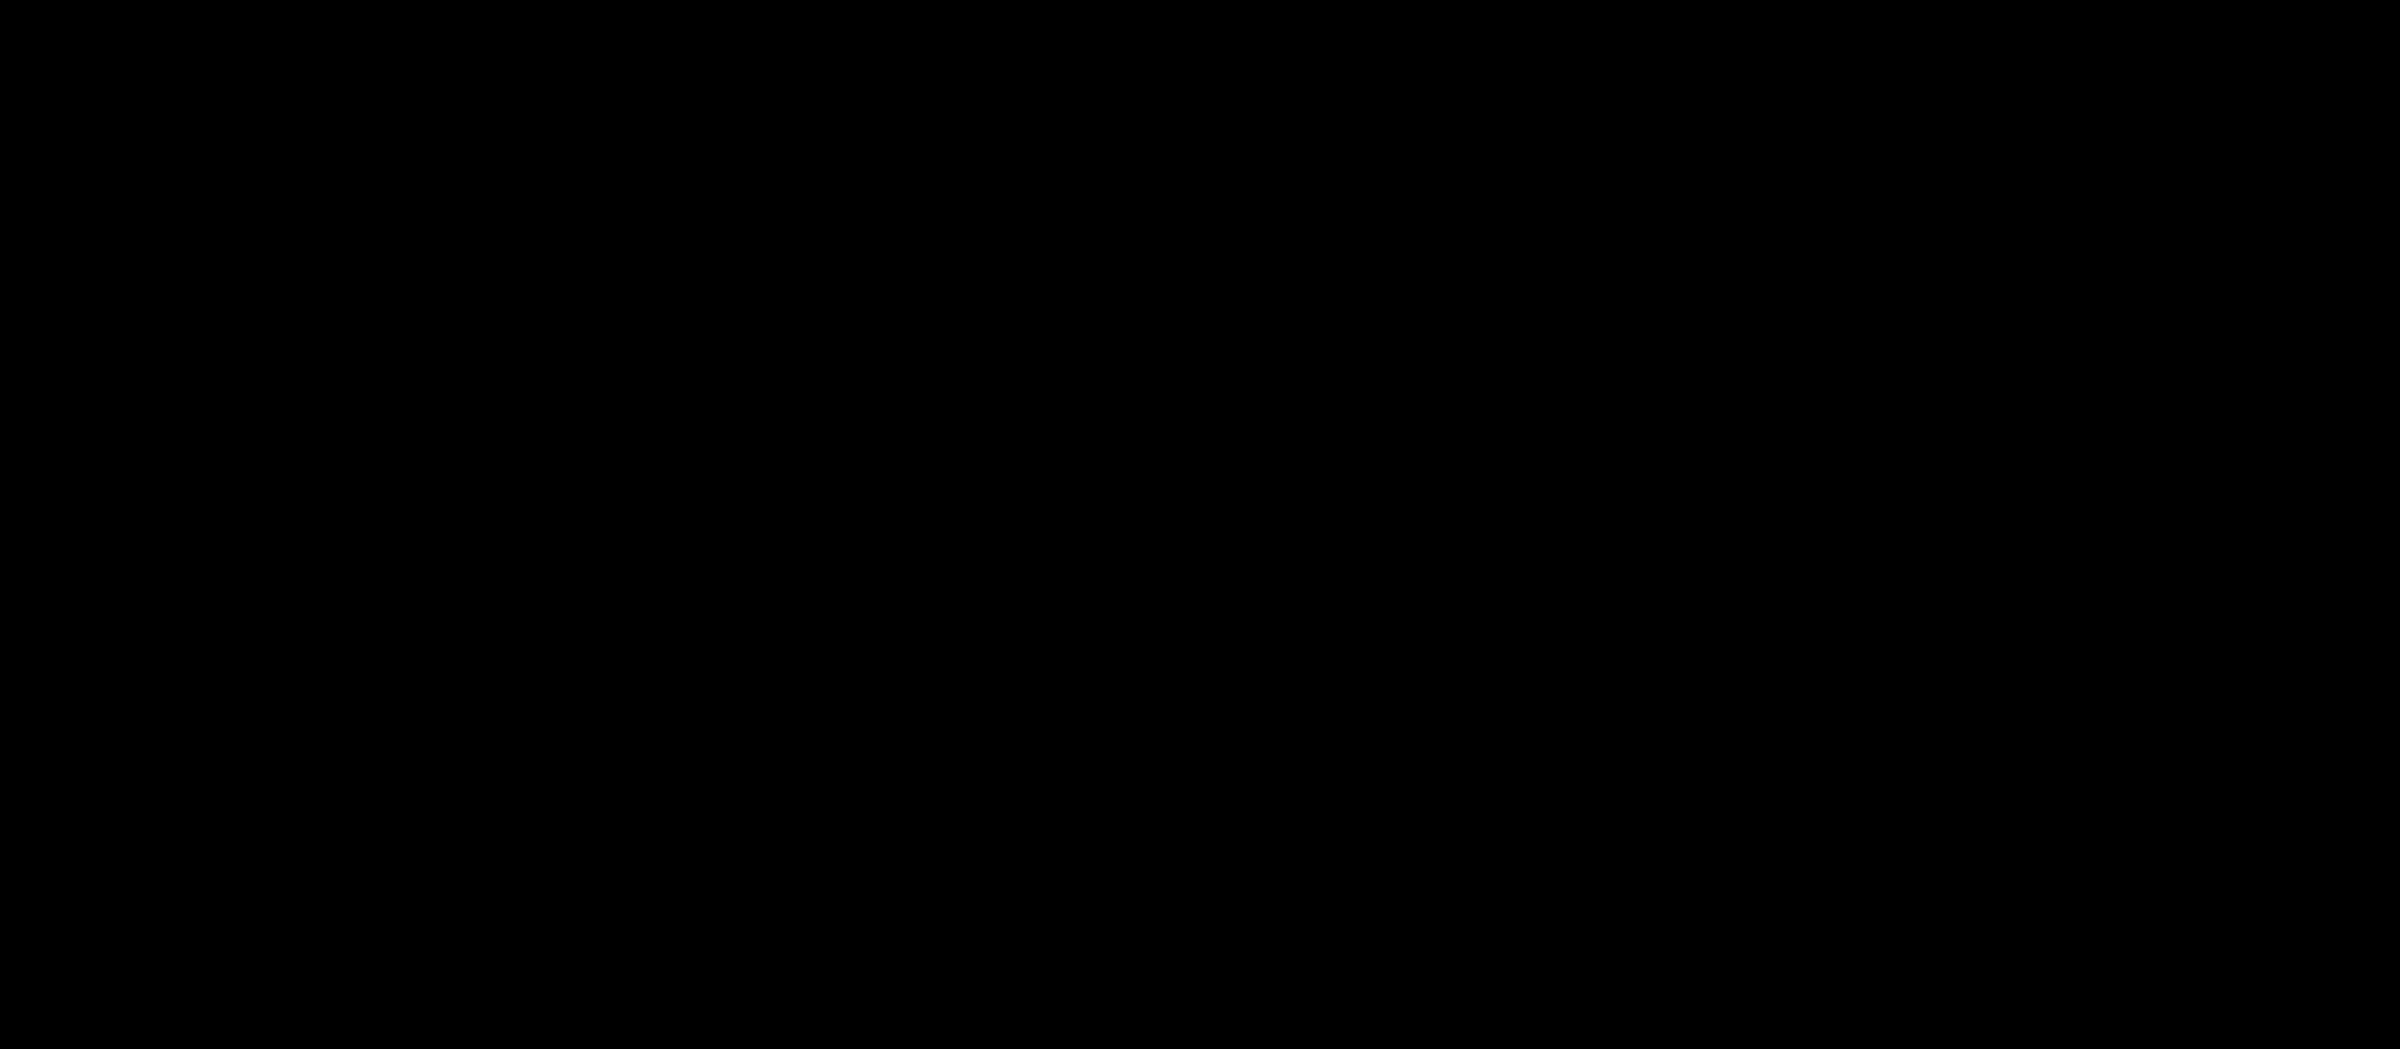 Code clipart Icon Clipart code icon Source